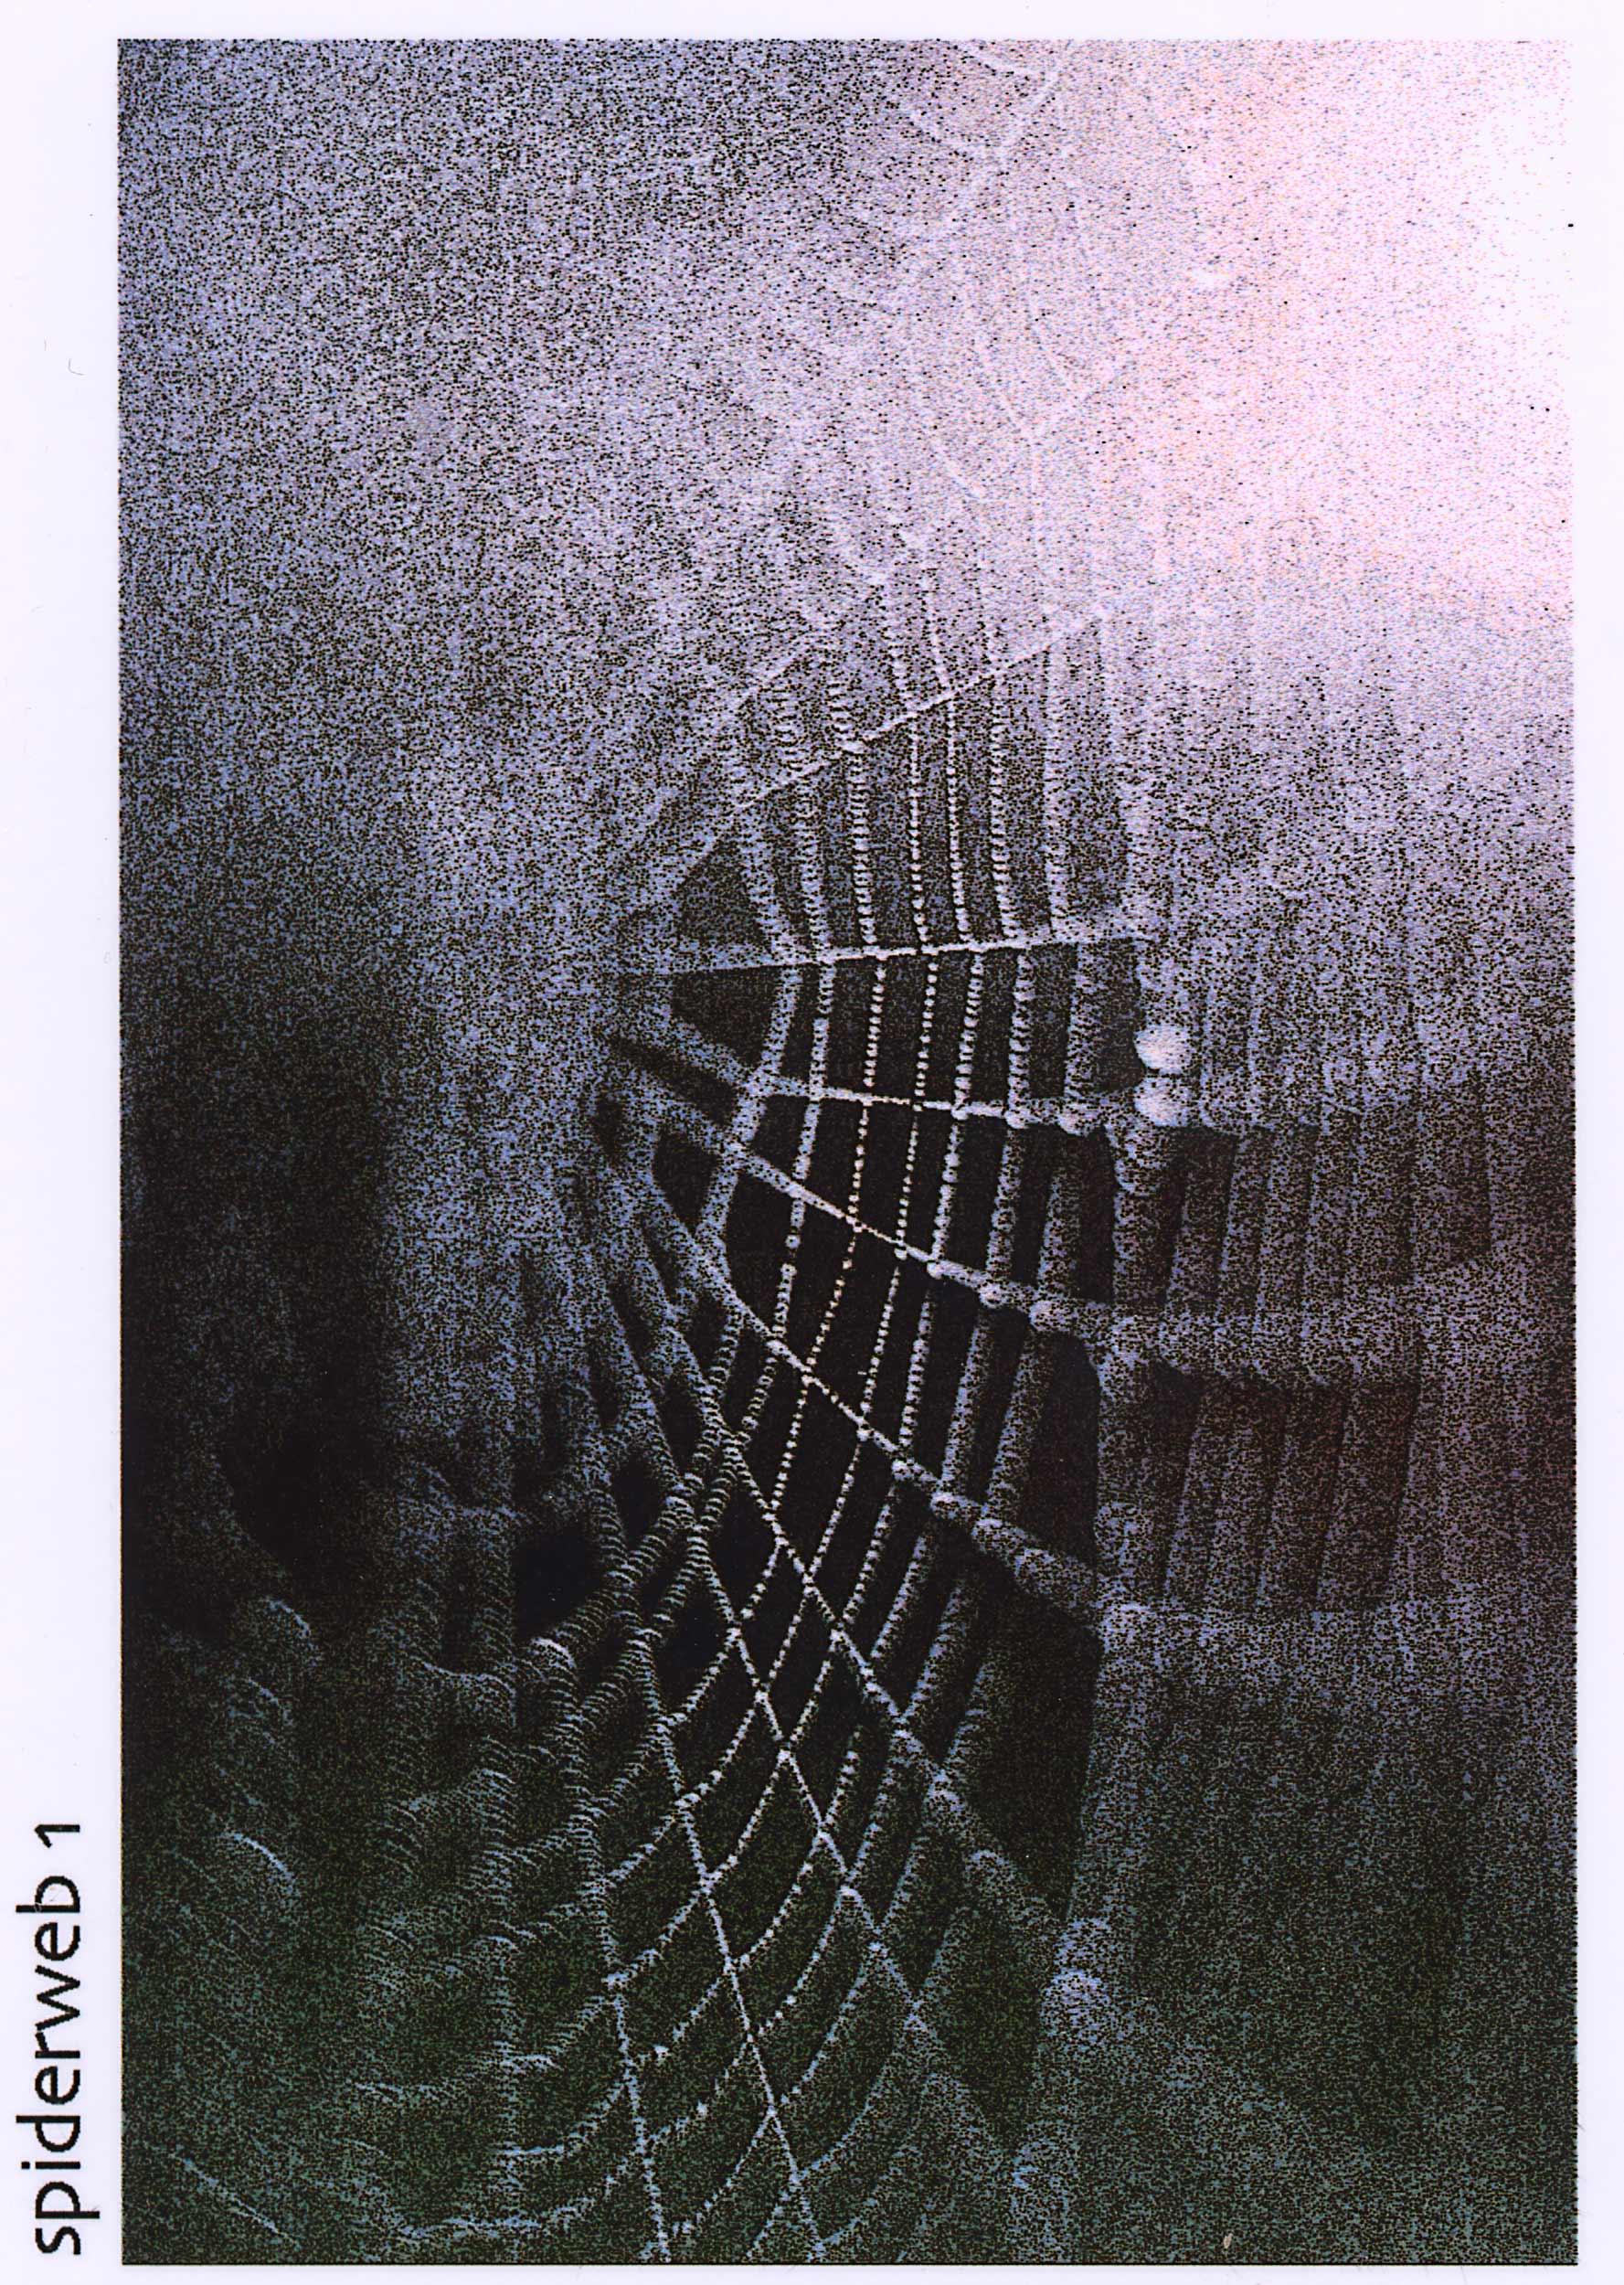 HUNTER_spiderweb_1.jpg